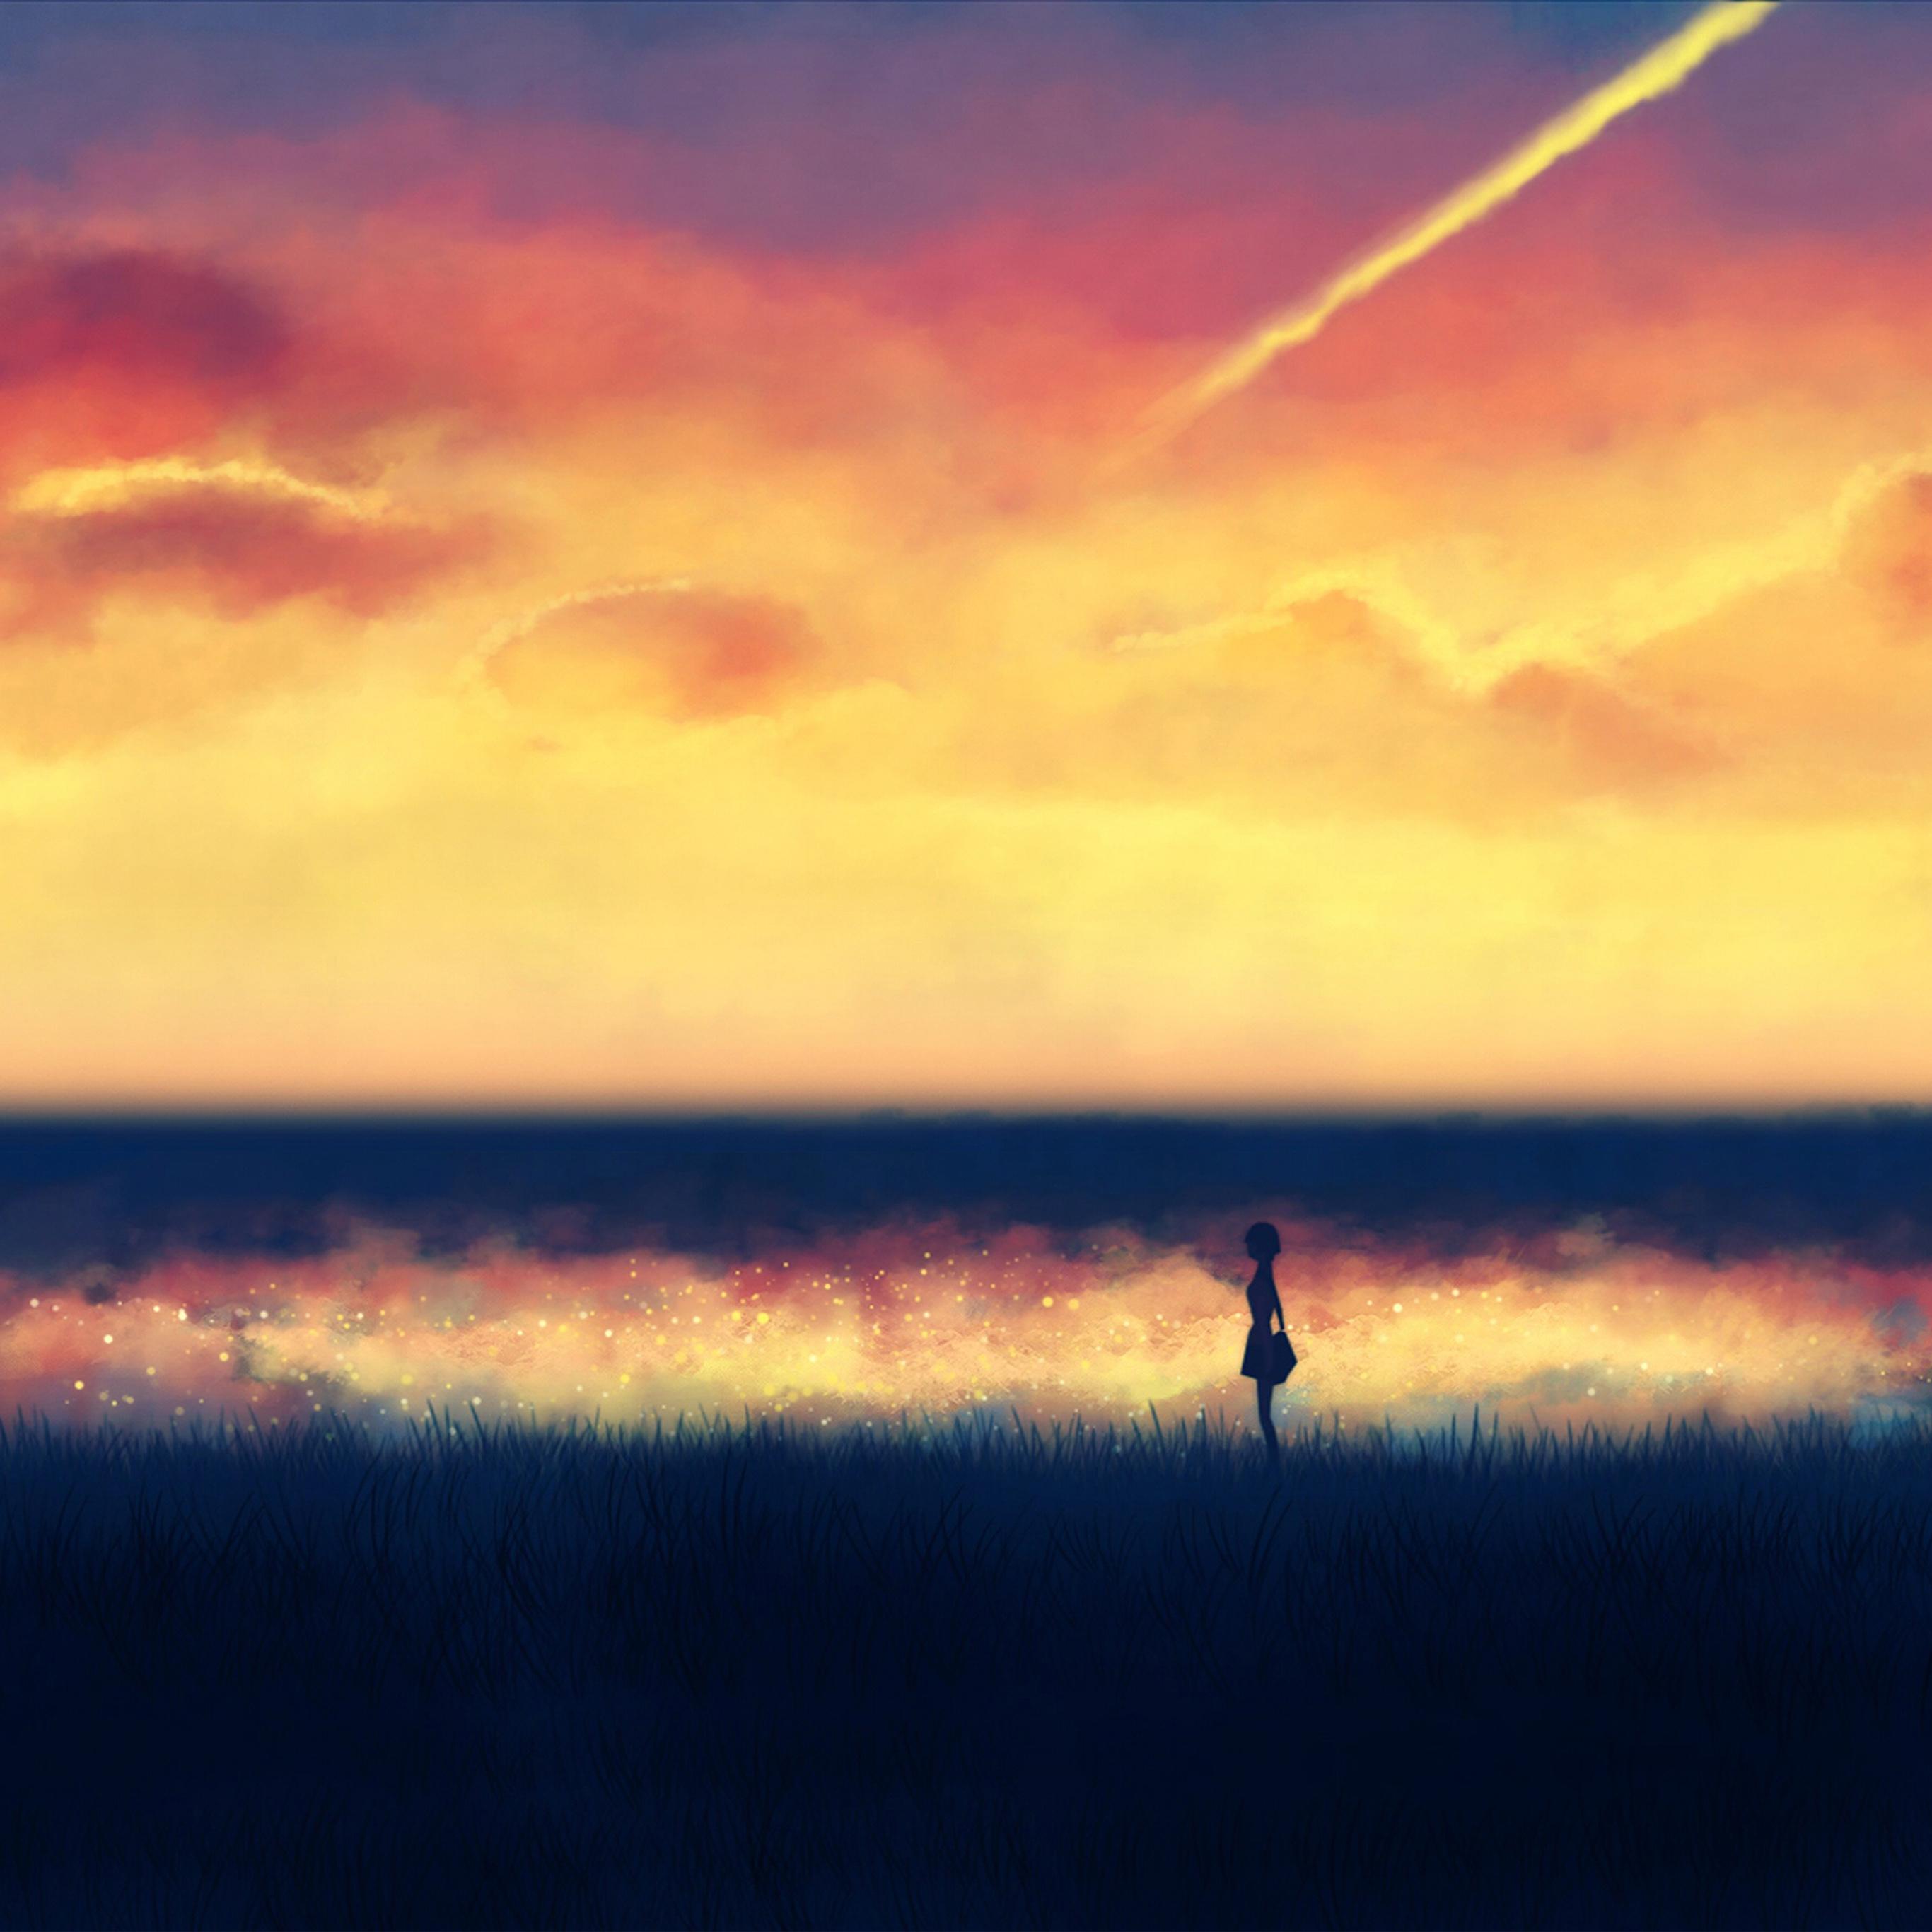 An83-fantasy-lonely-ilust-art-sunset-paint